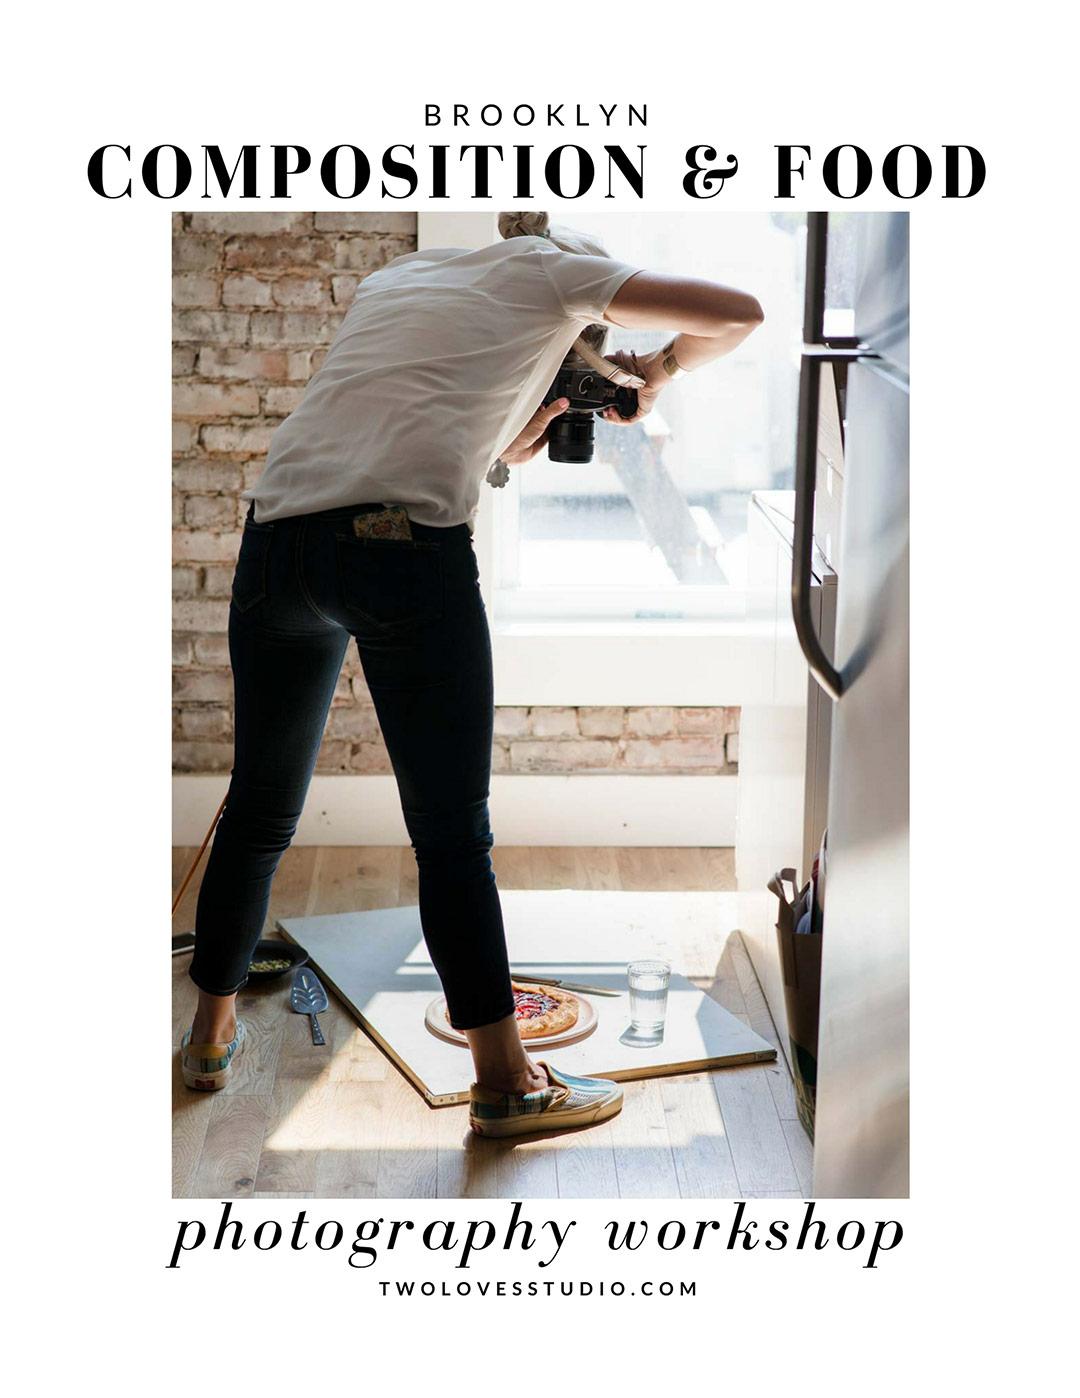 Brooklyn Composition Food Photography Workshop with Rachel Korinek